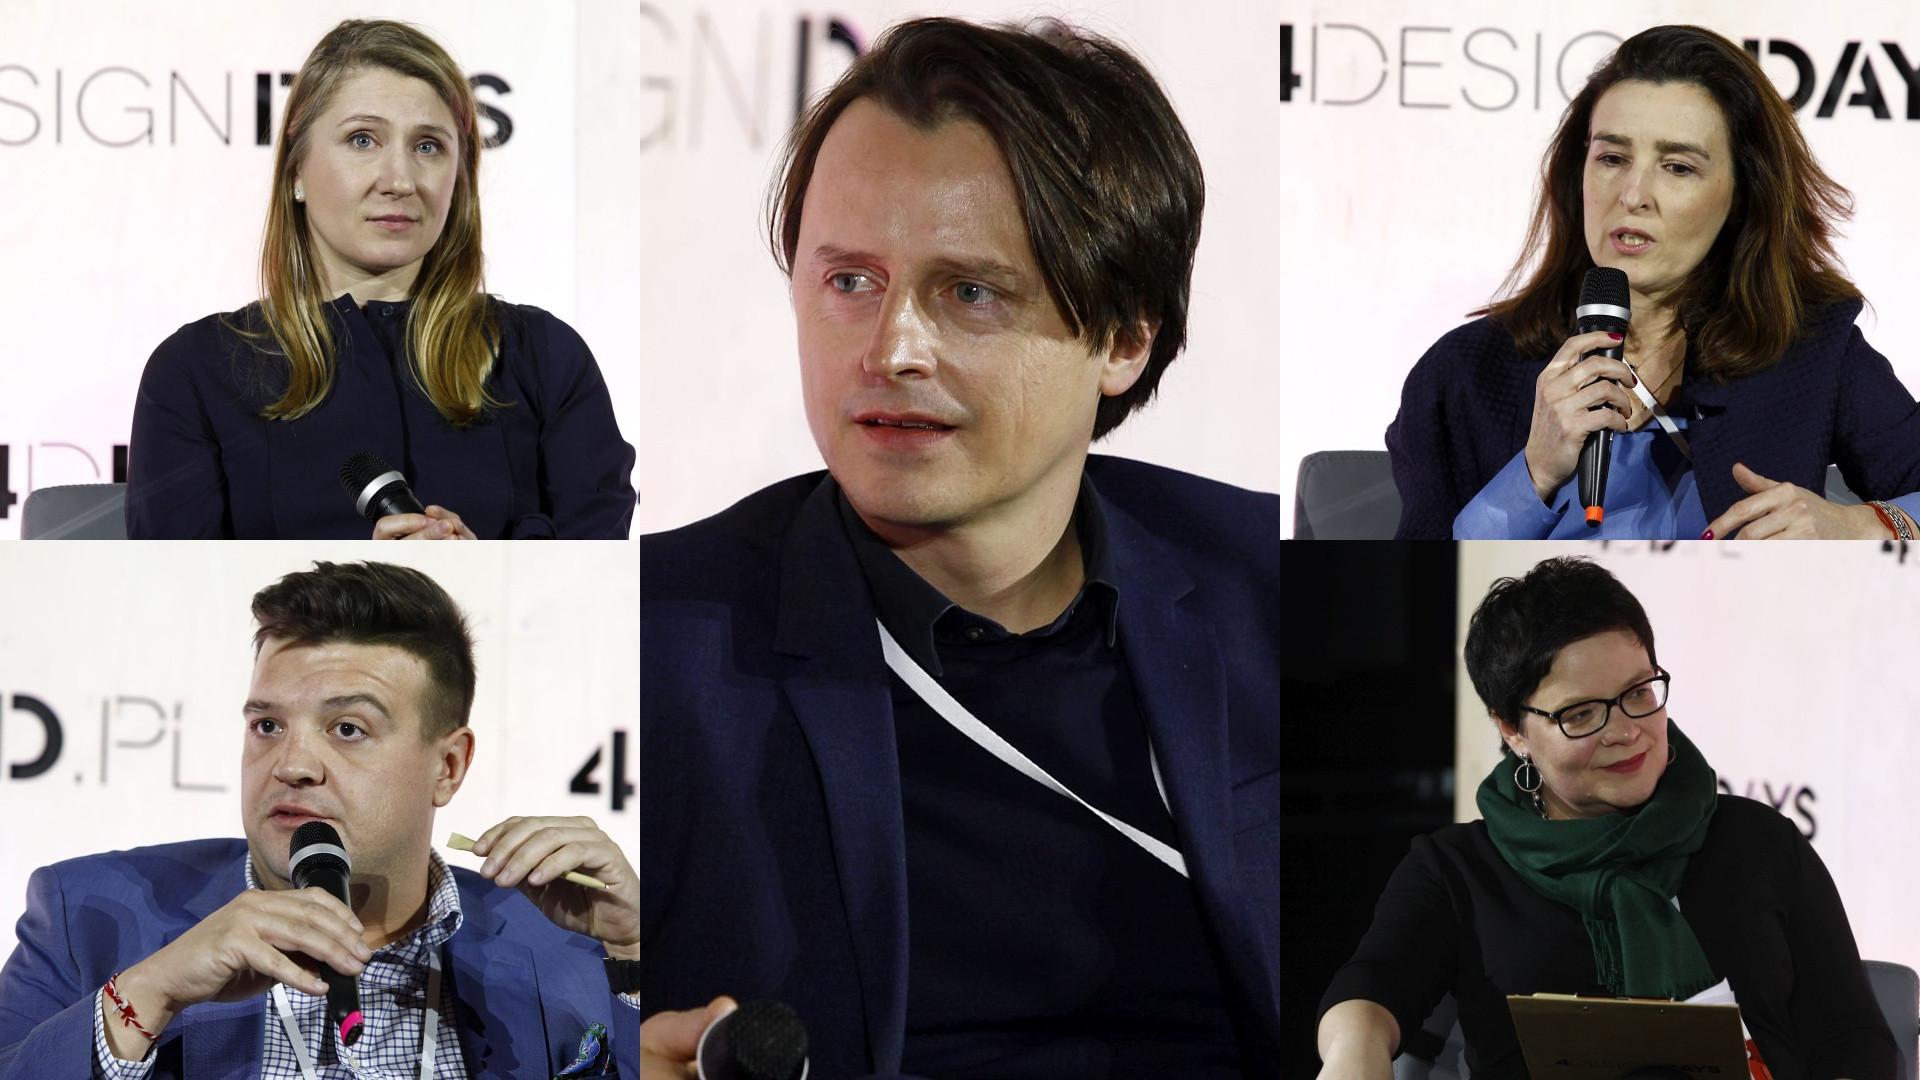 Oskar Zięta, Magdalena Borowiec, Magdalena Hubka, Bartosz Chmielewski, Justyna Łotowska